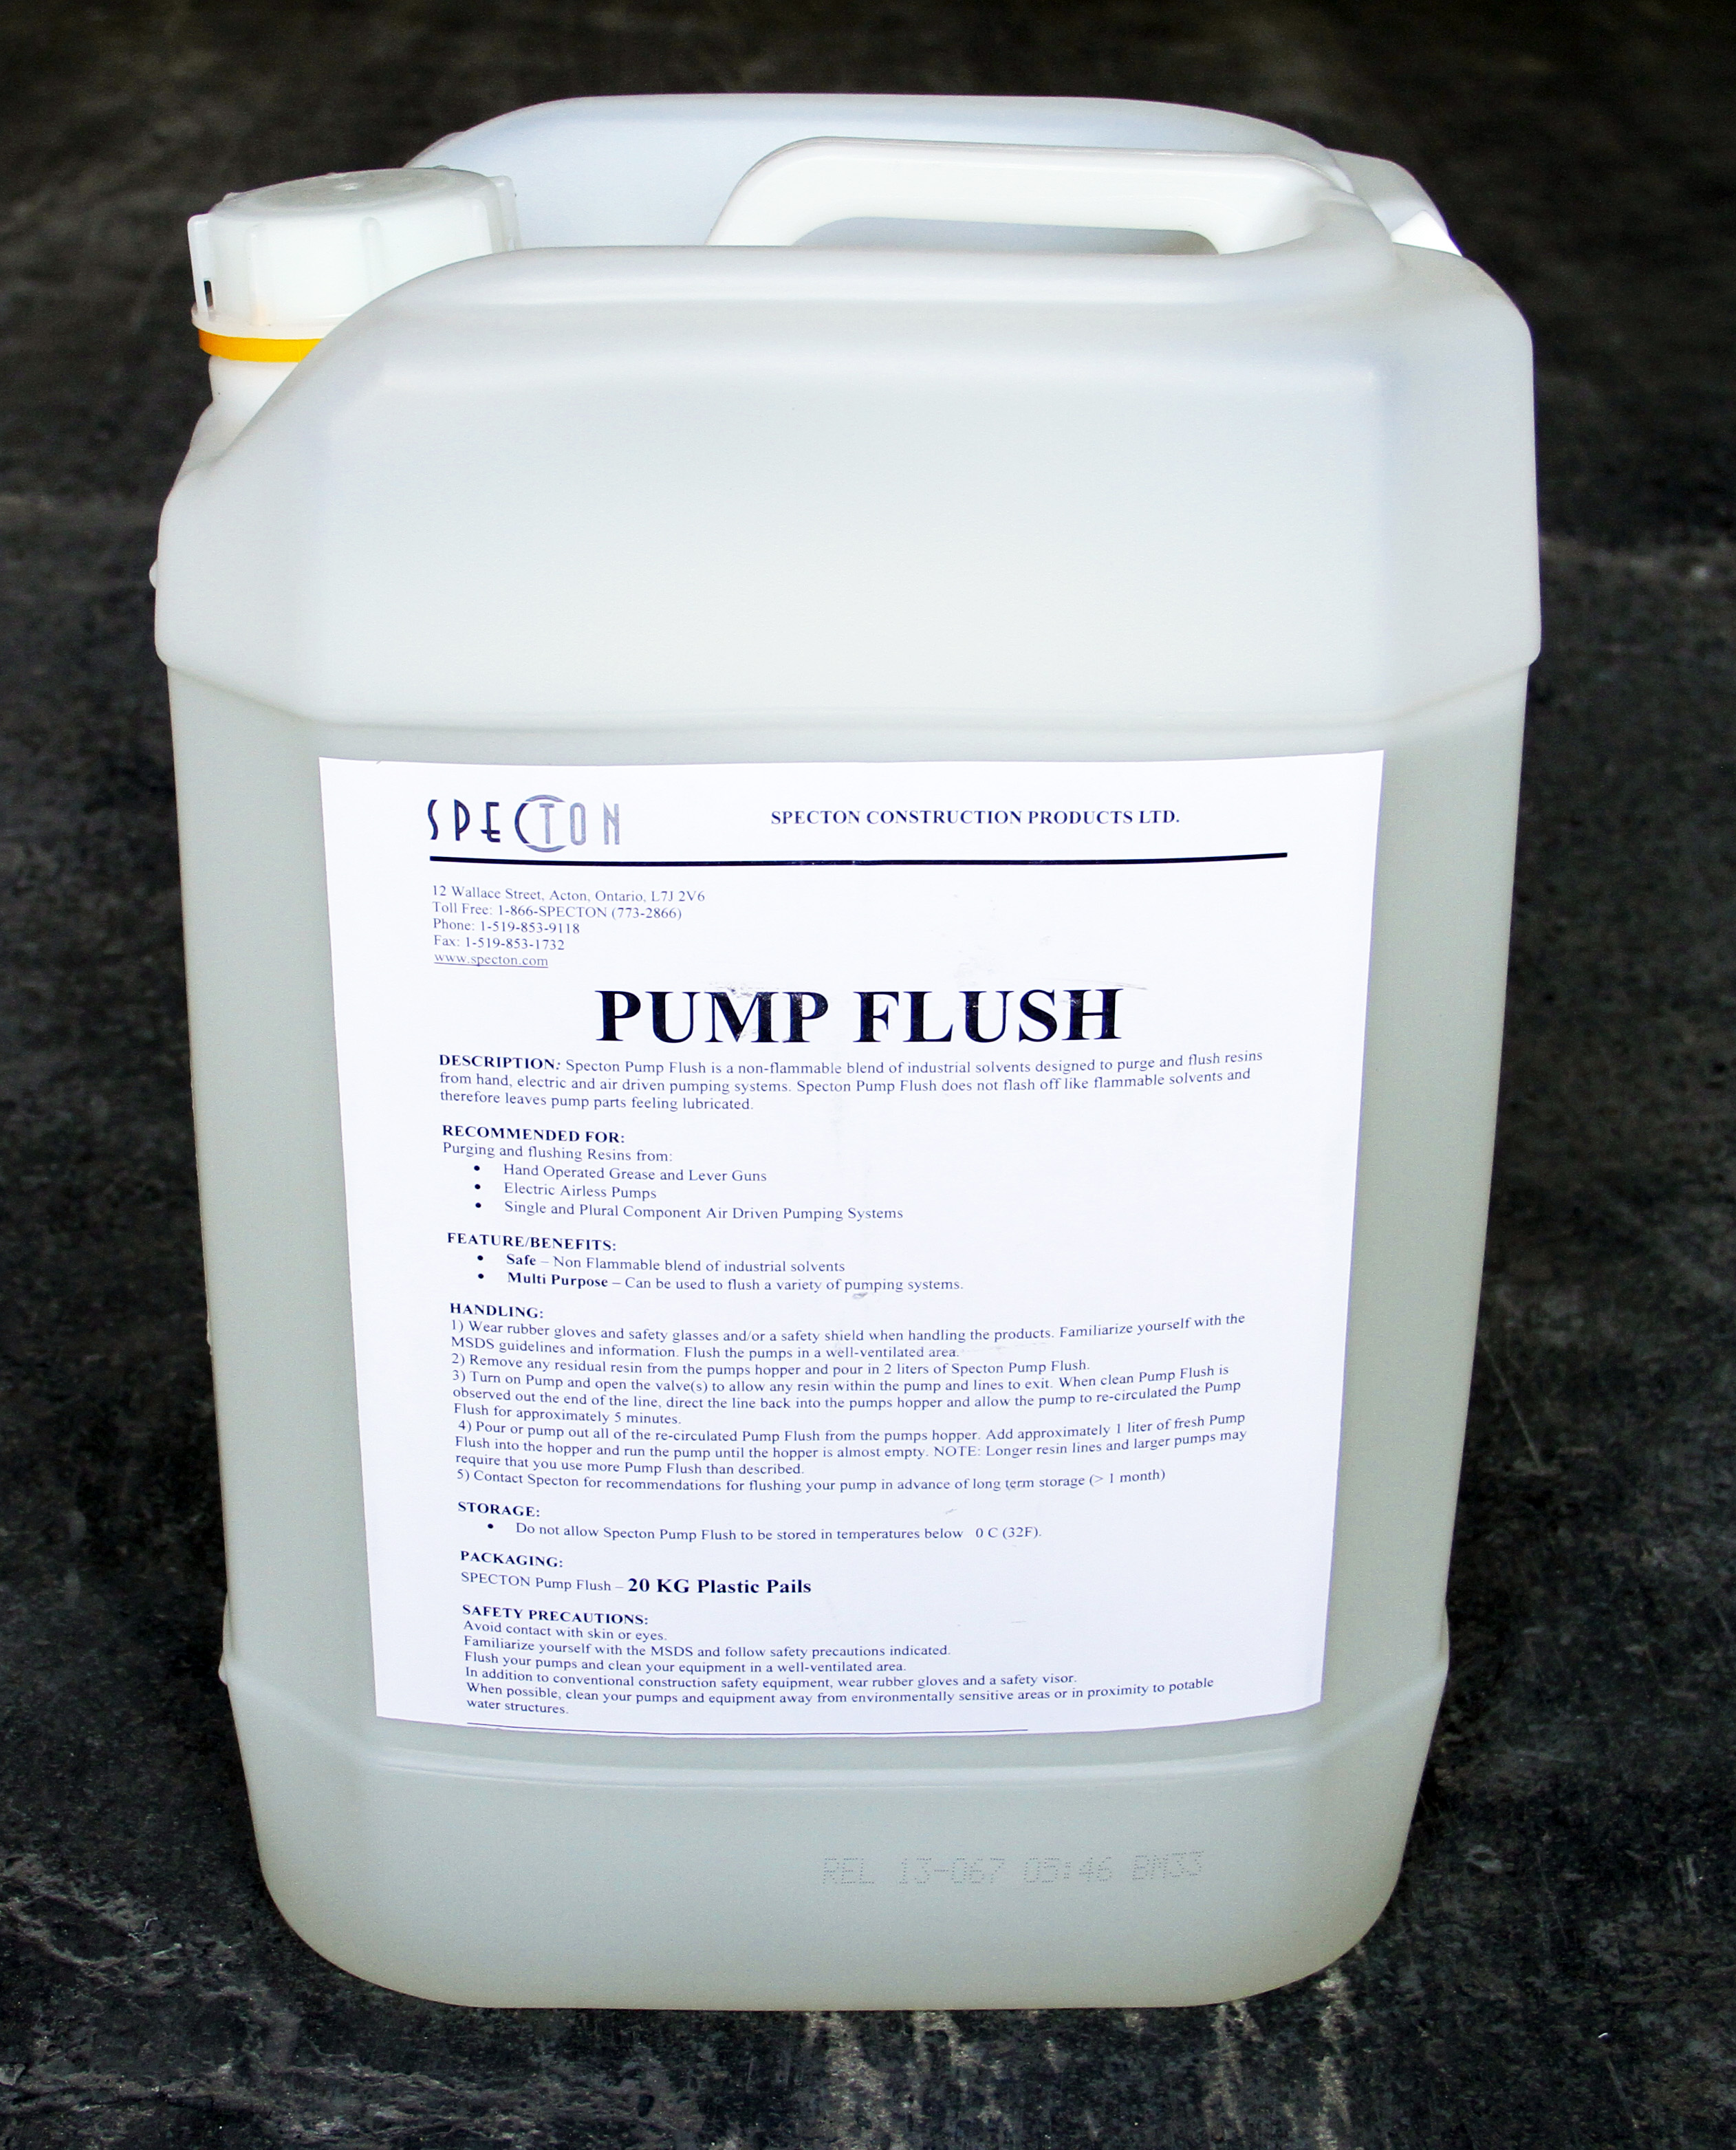 PUMP FLUSH